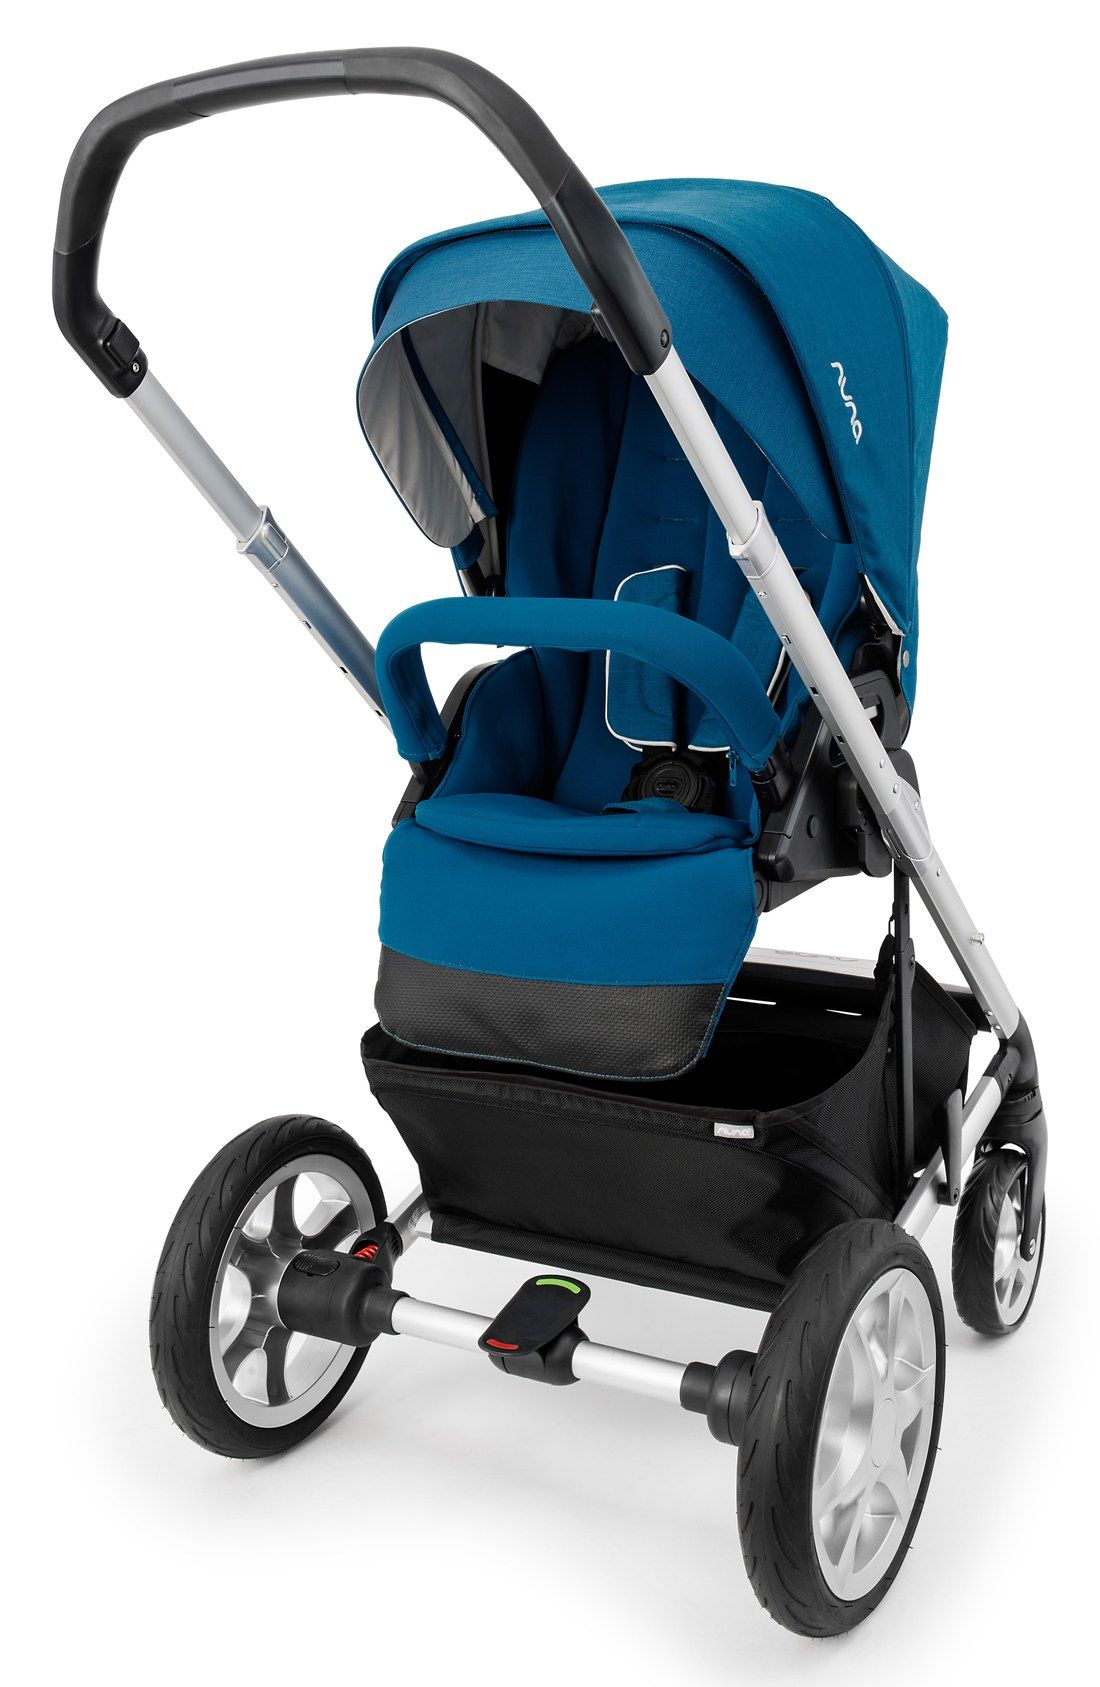 Best Jogging Stroller For New Mother Baby strollers